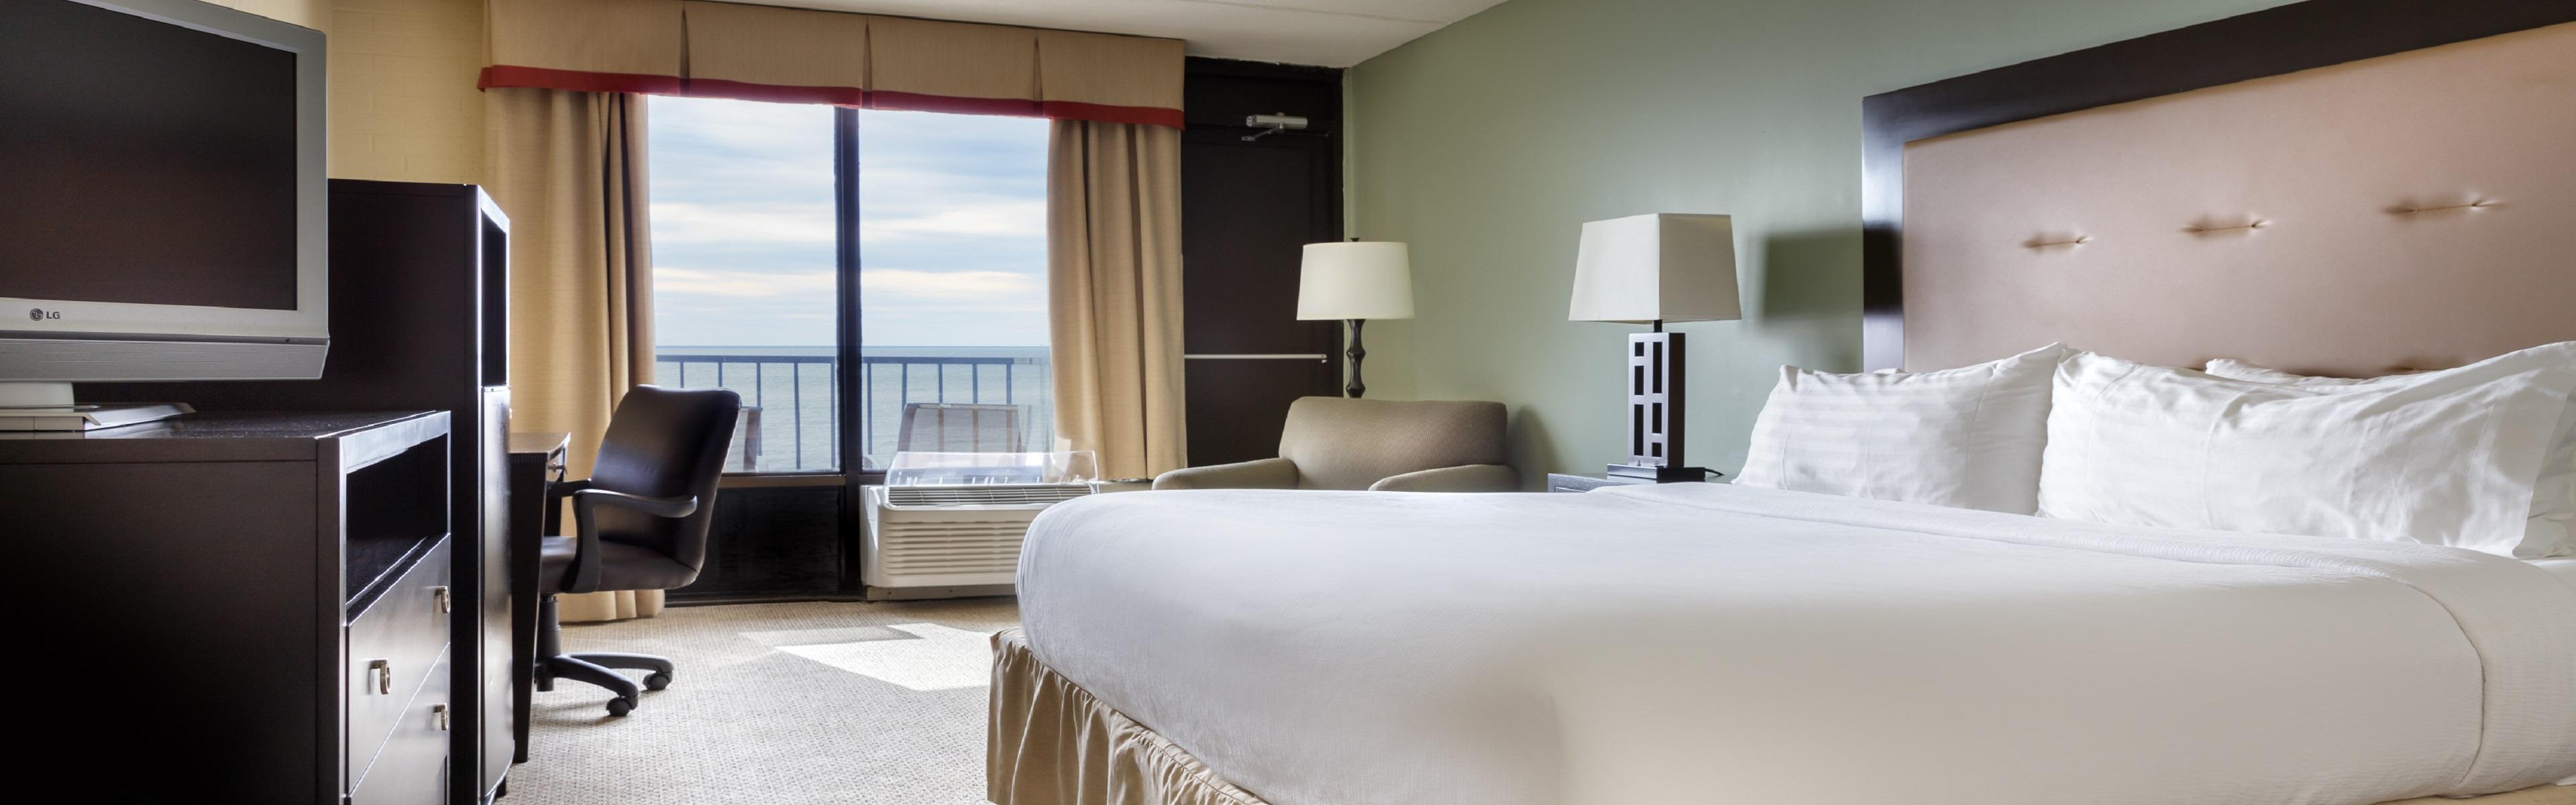 Holiday Inn Resort Galveston-On The Beach image 1